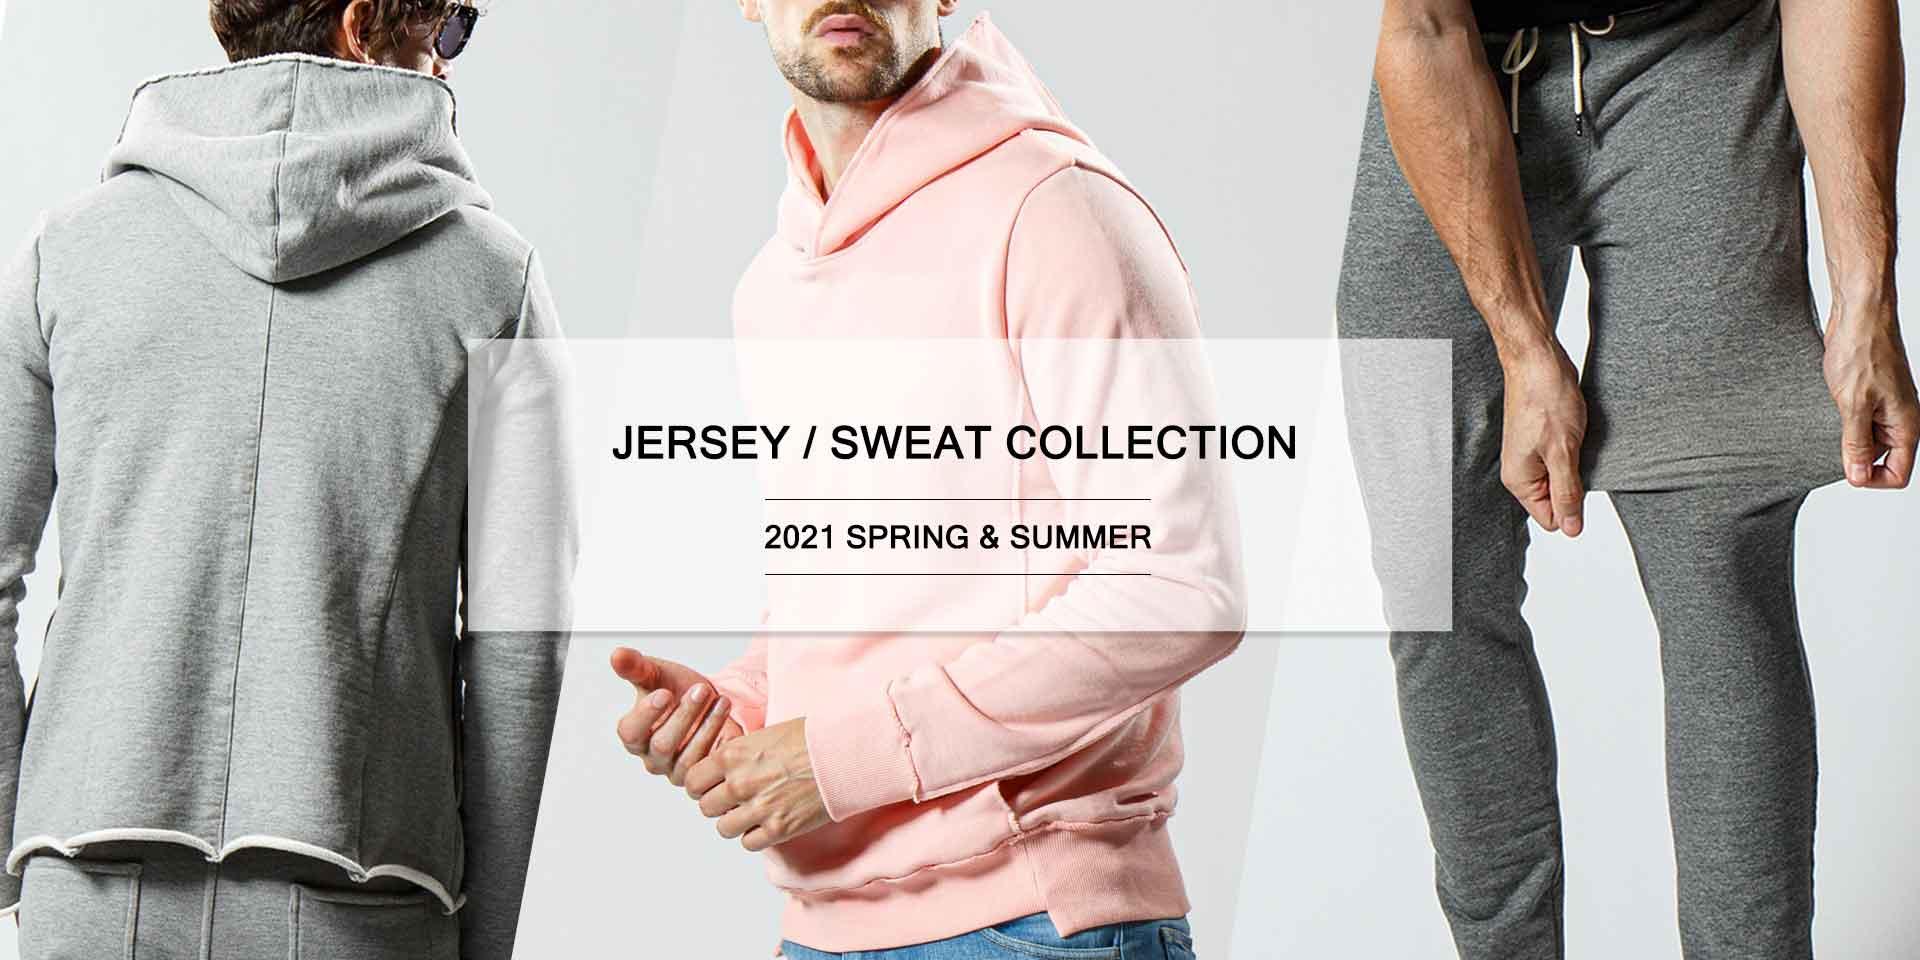 wjk jersey sweat